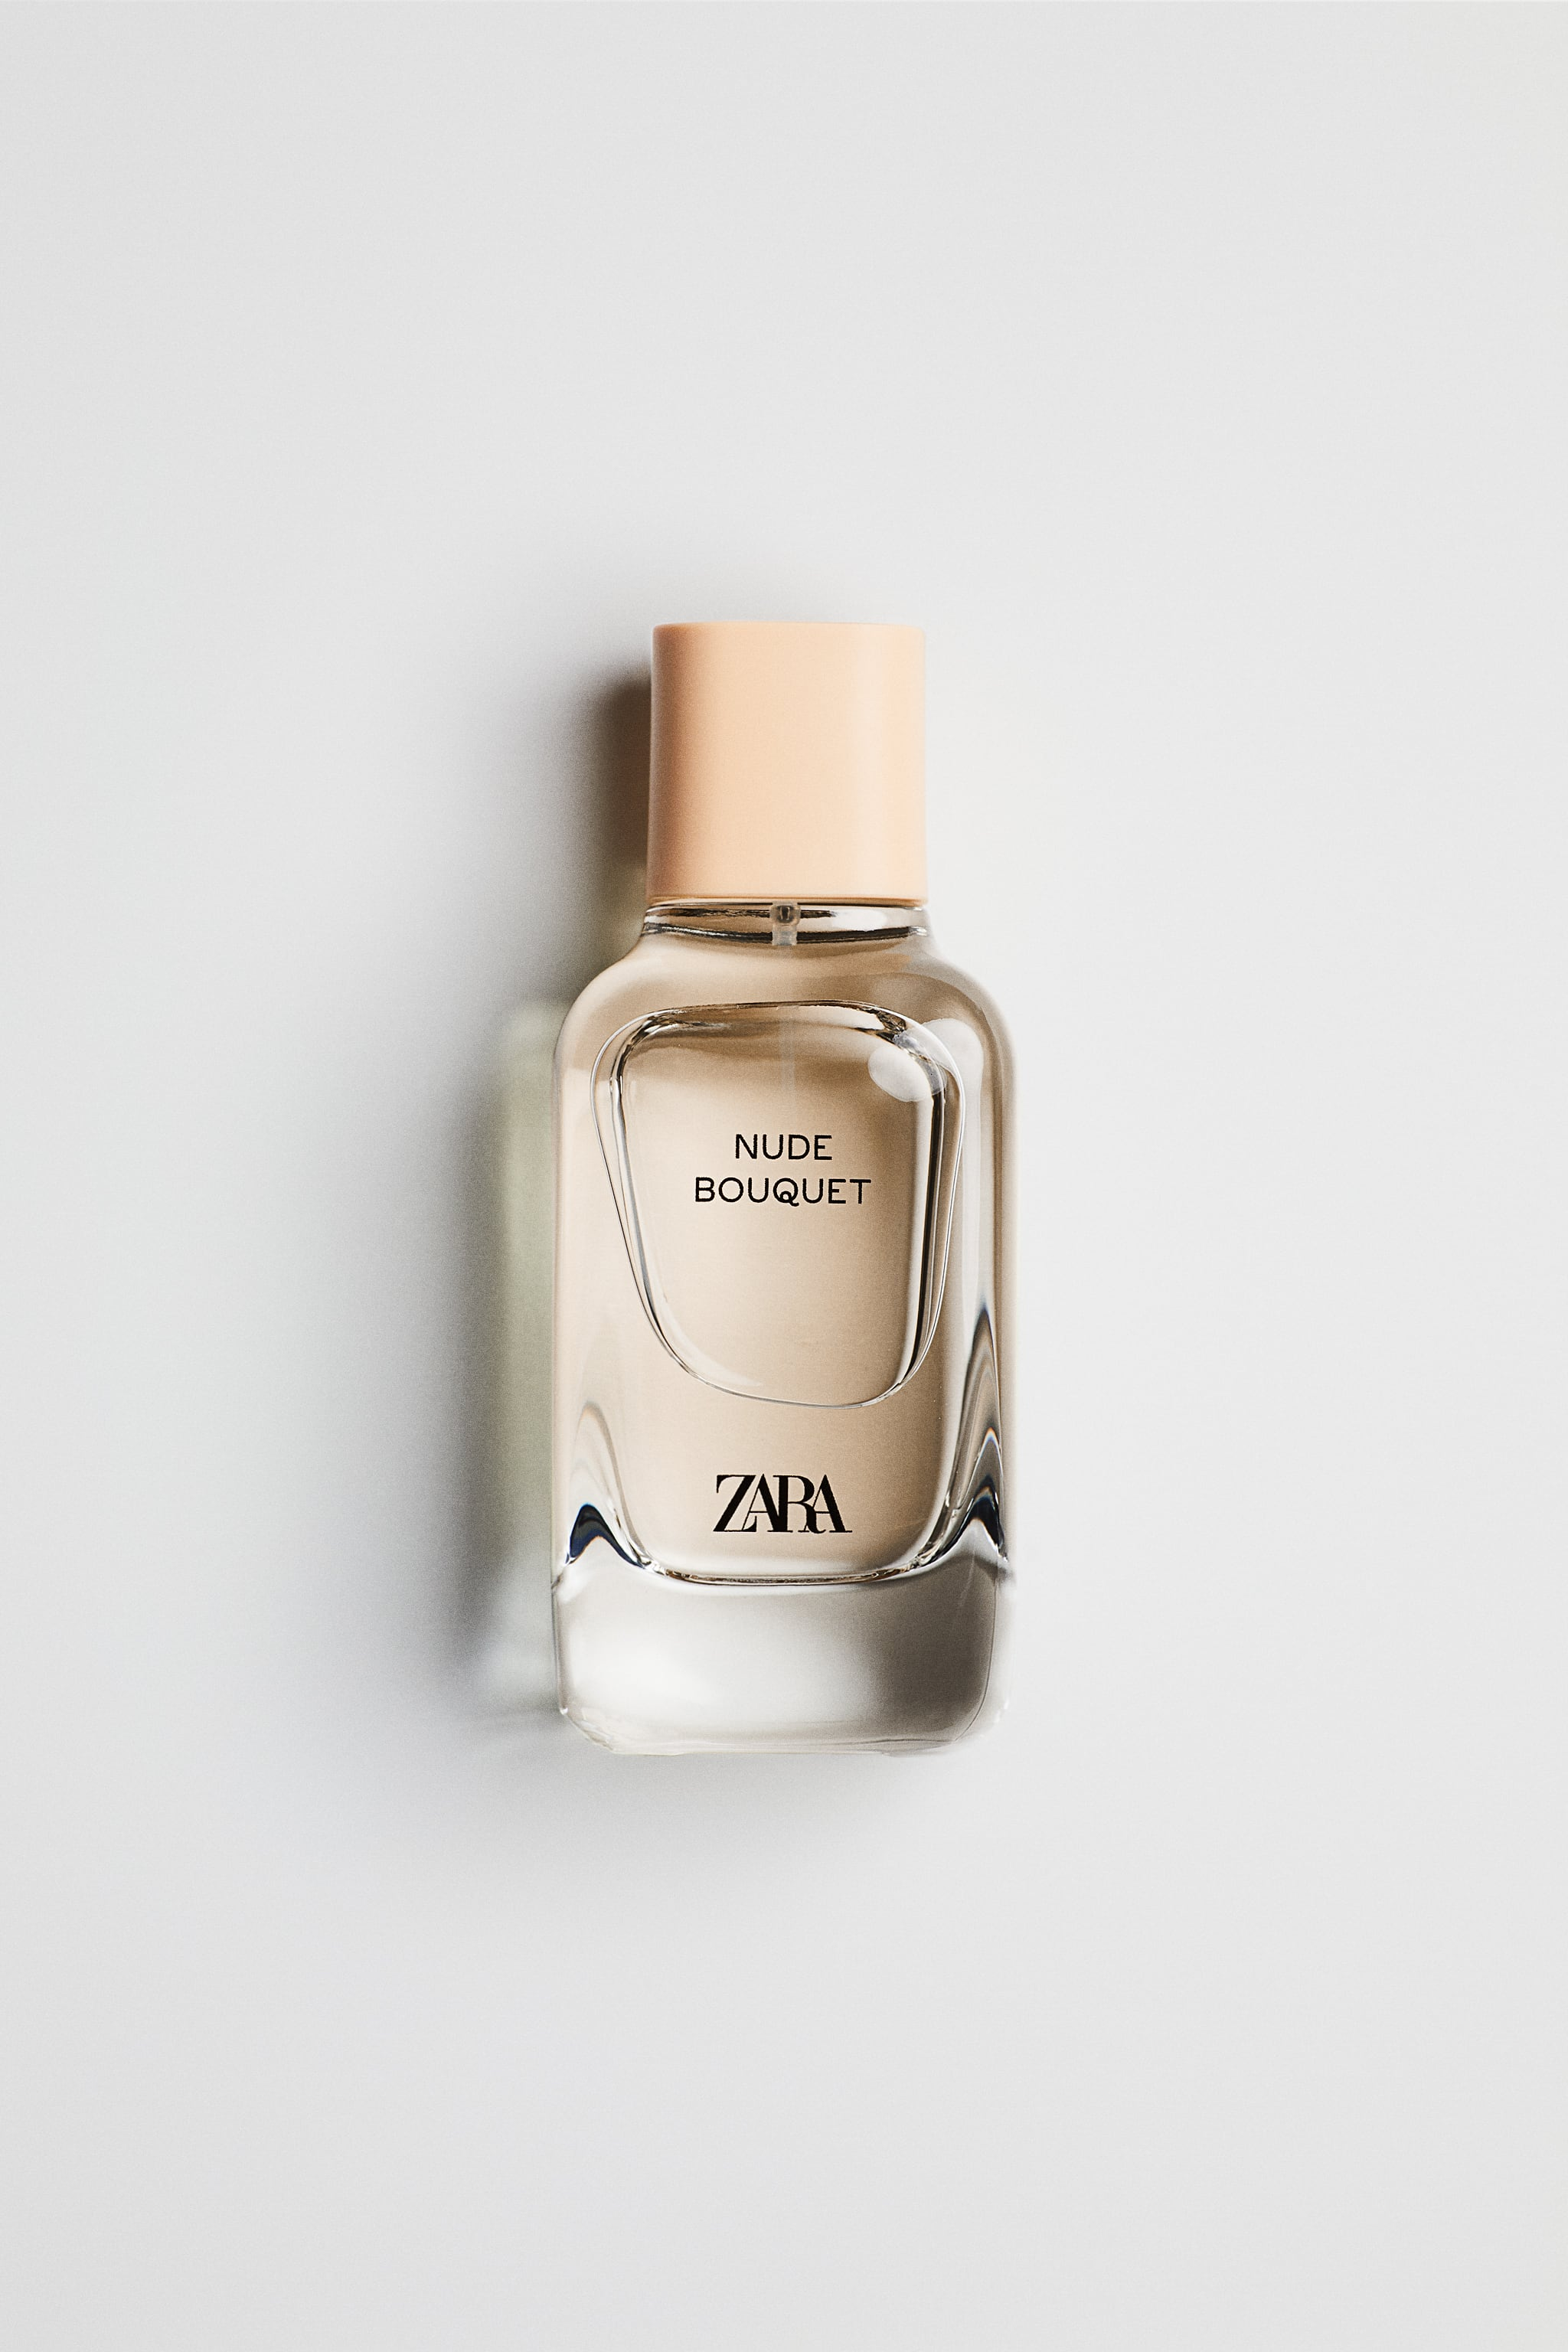 Zara NUDE BOUQUET 100 ML